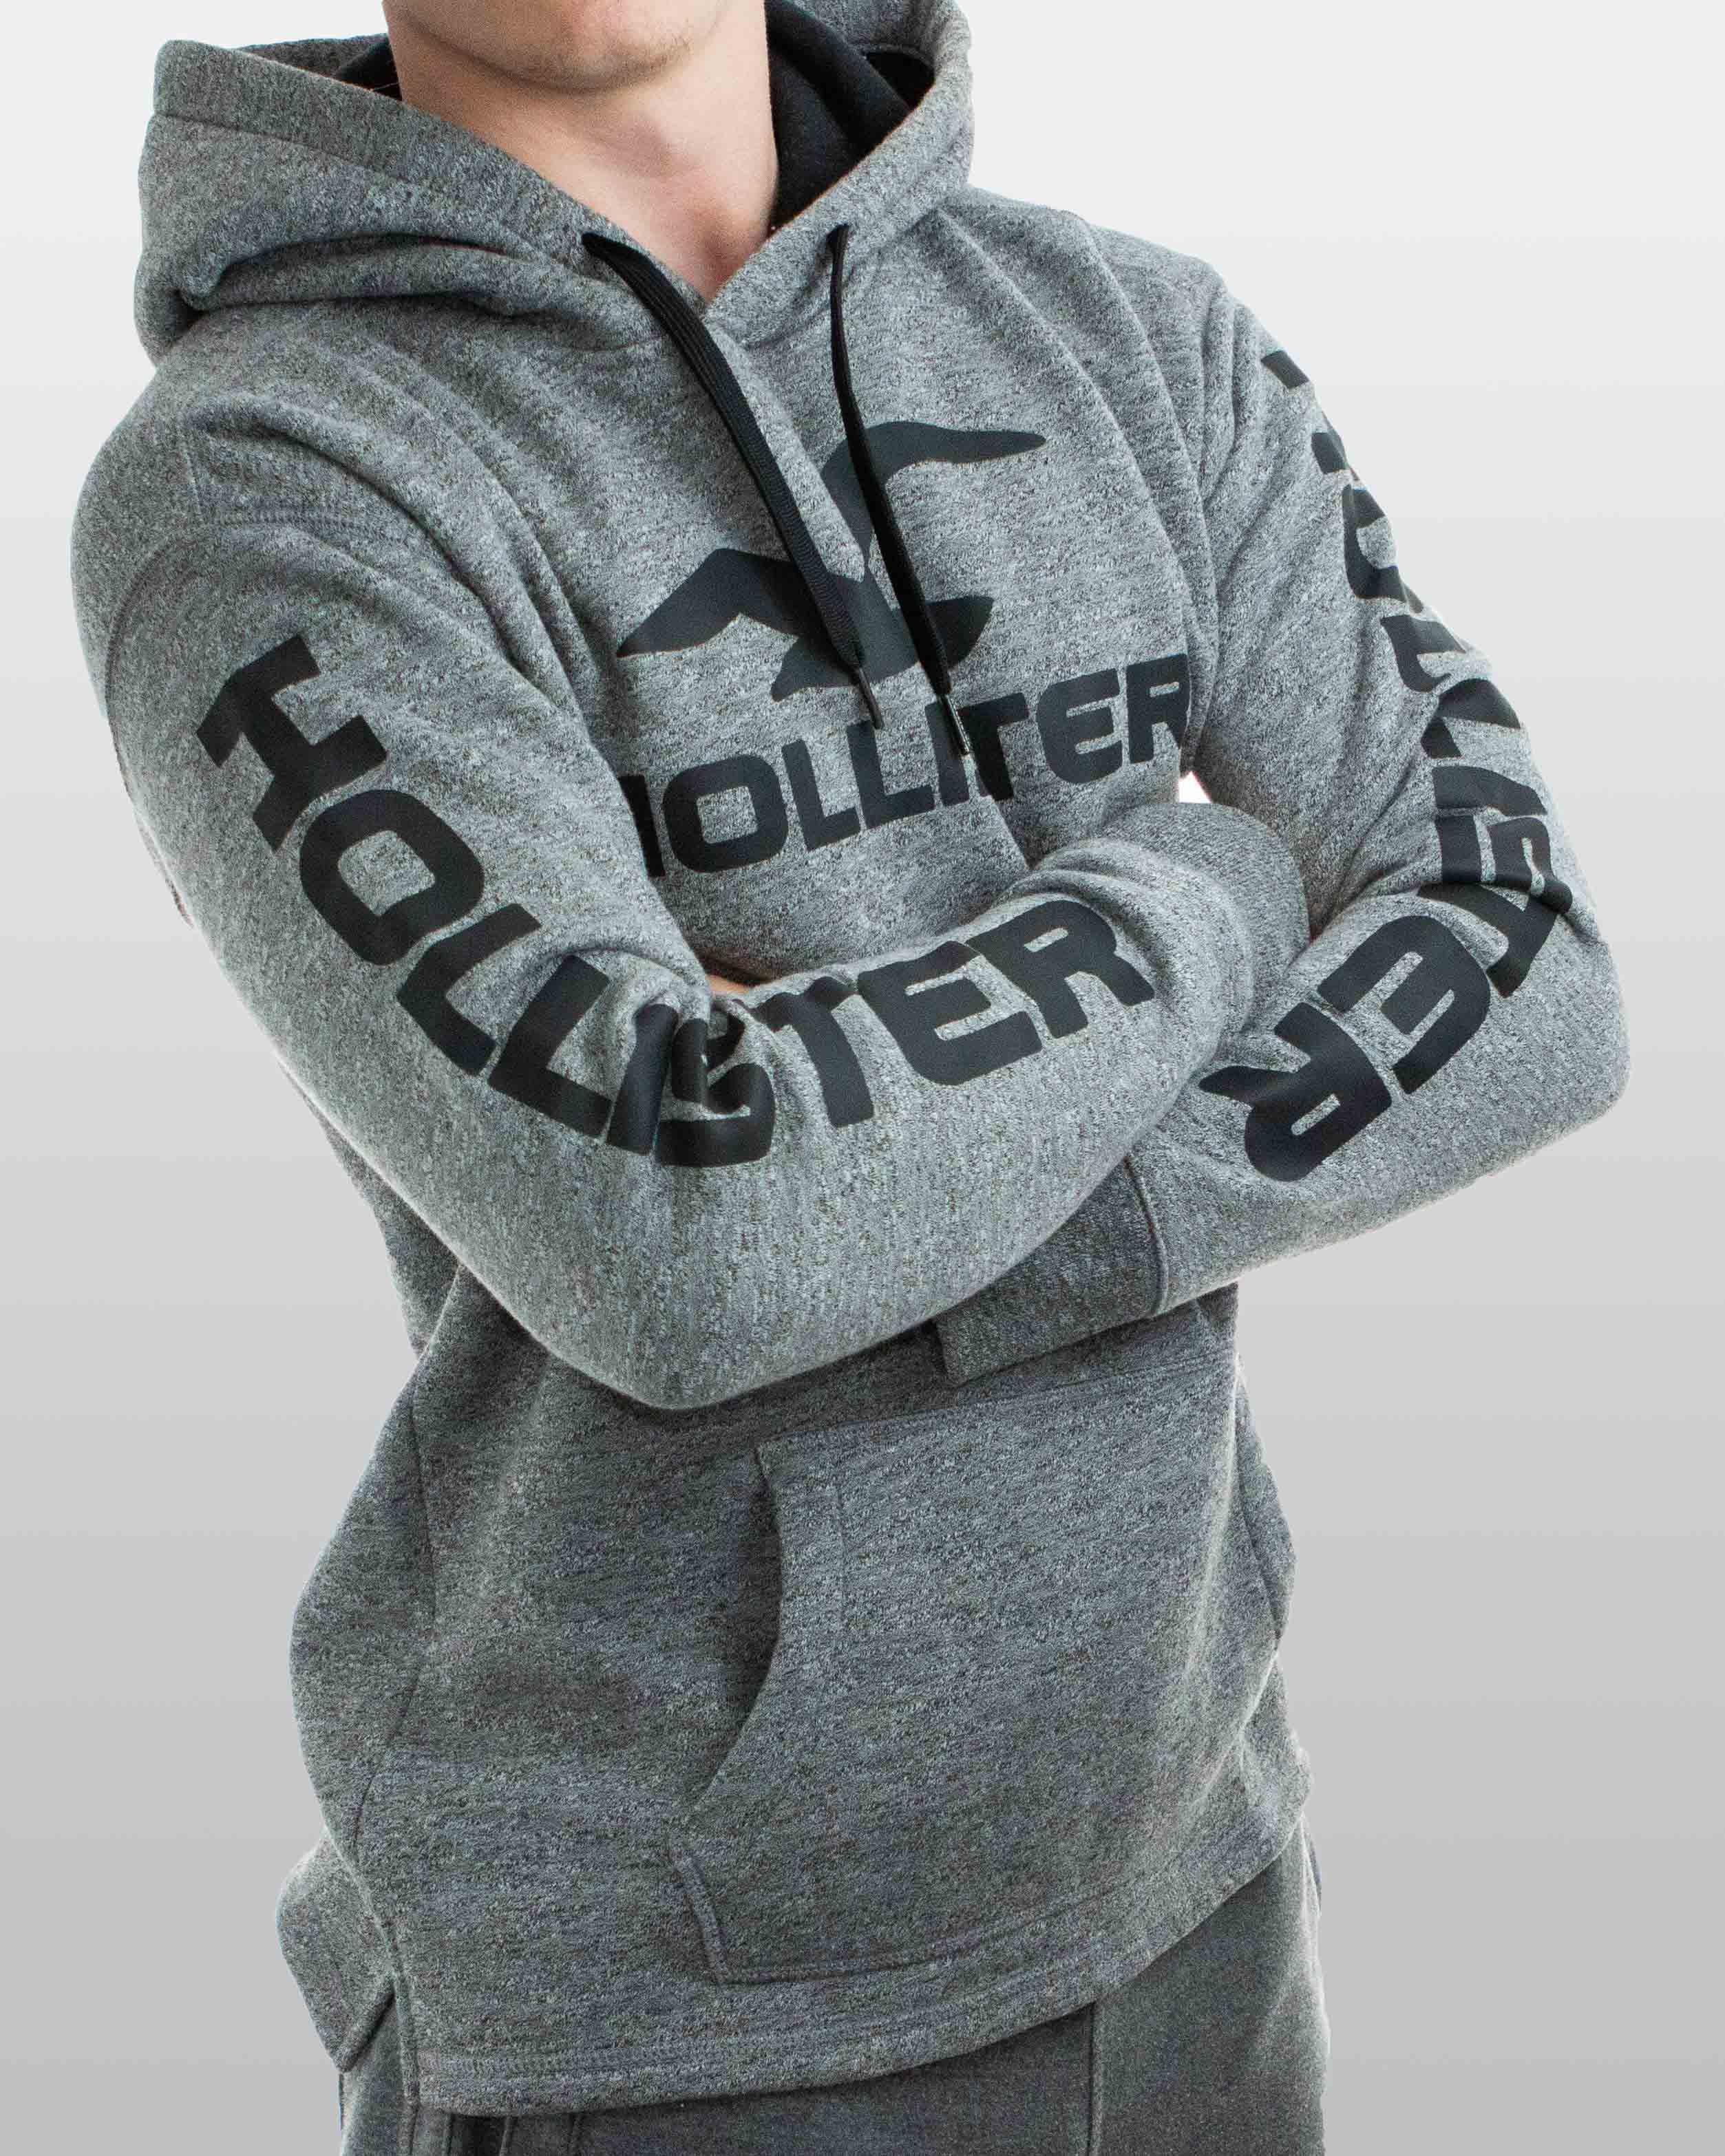 Pánská mikina Hollister Logo sivá  02de639981c